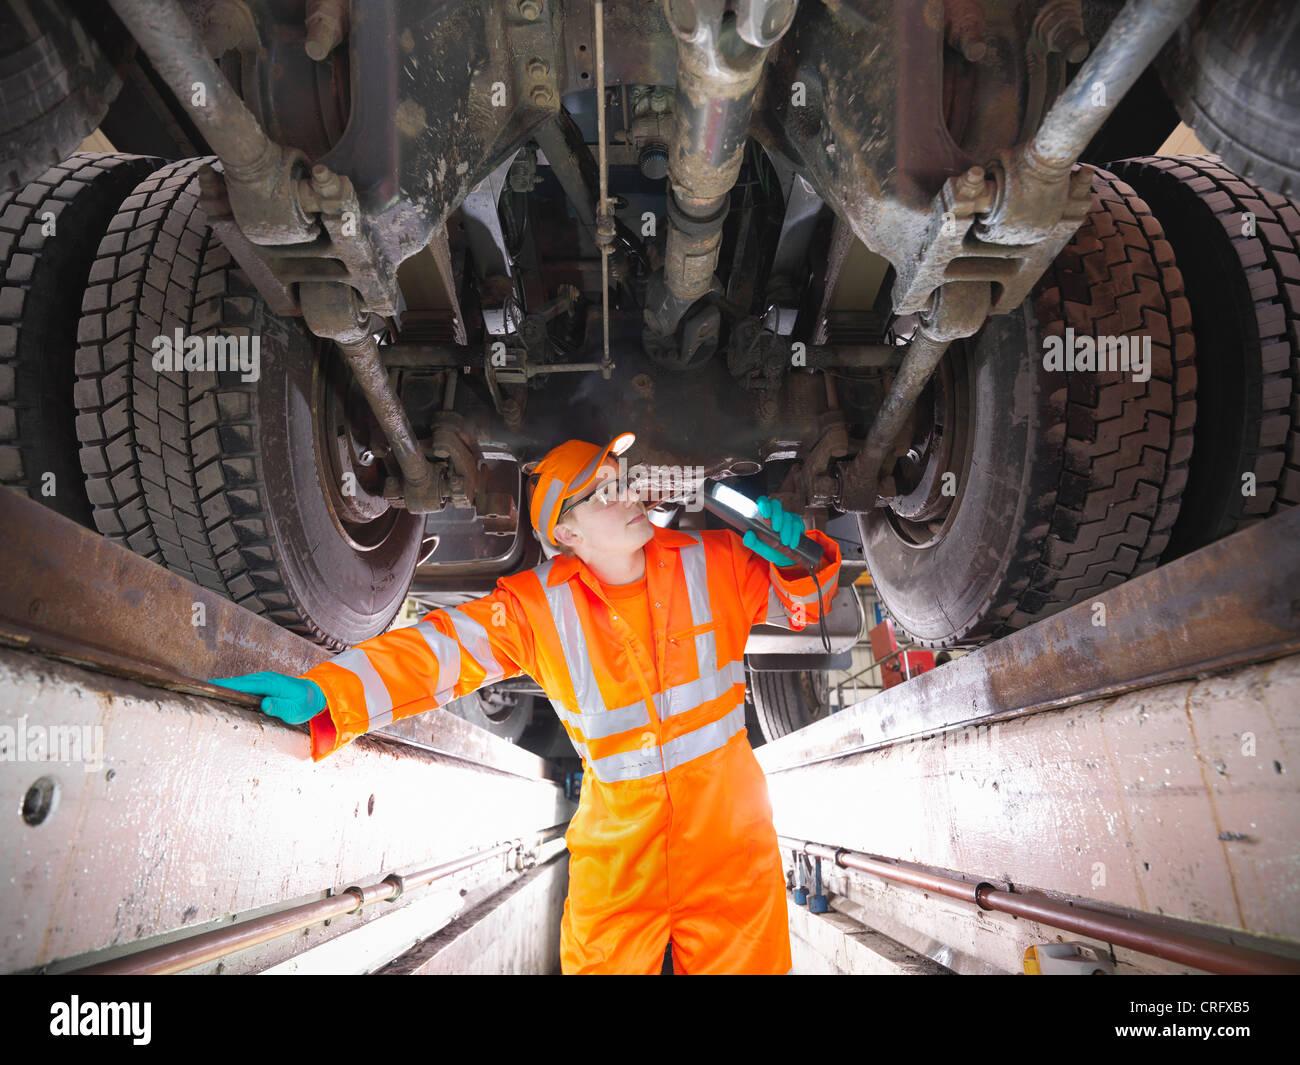 Apprentice engineer examining engine - Stock Image